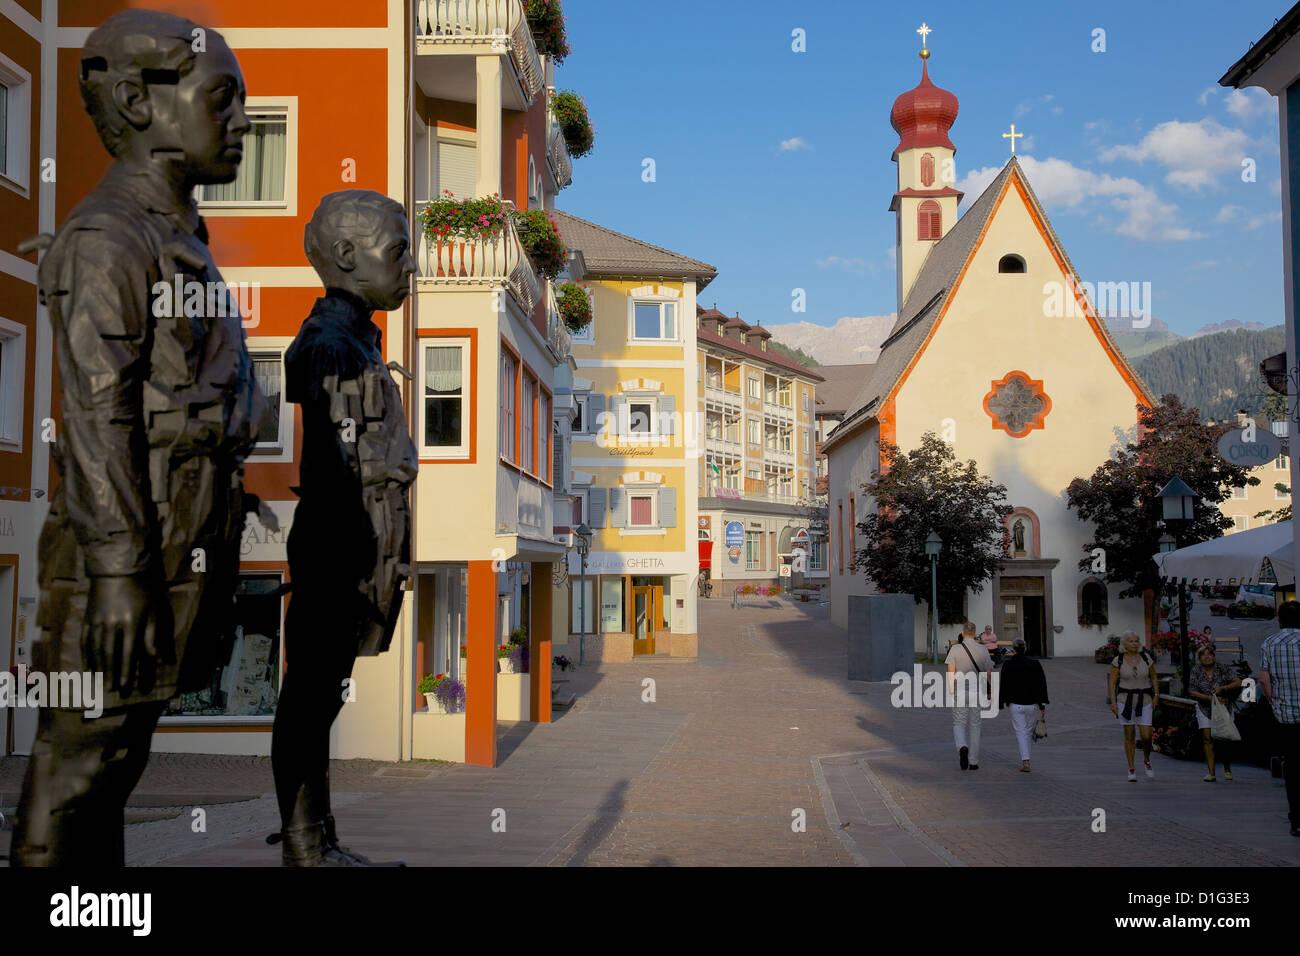 Street sculpture and Little Church, Ortisei, Gardena Valley, Bolzano Province, South Tyrol, Italian Dolomites, Italy - Stock Image